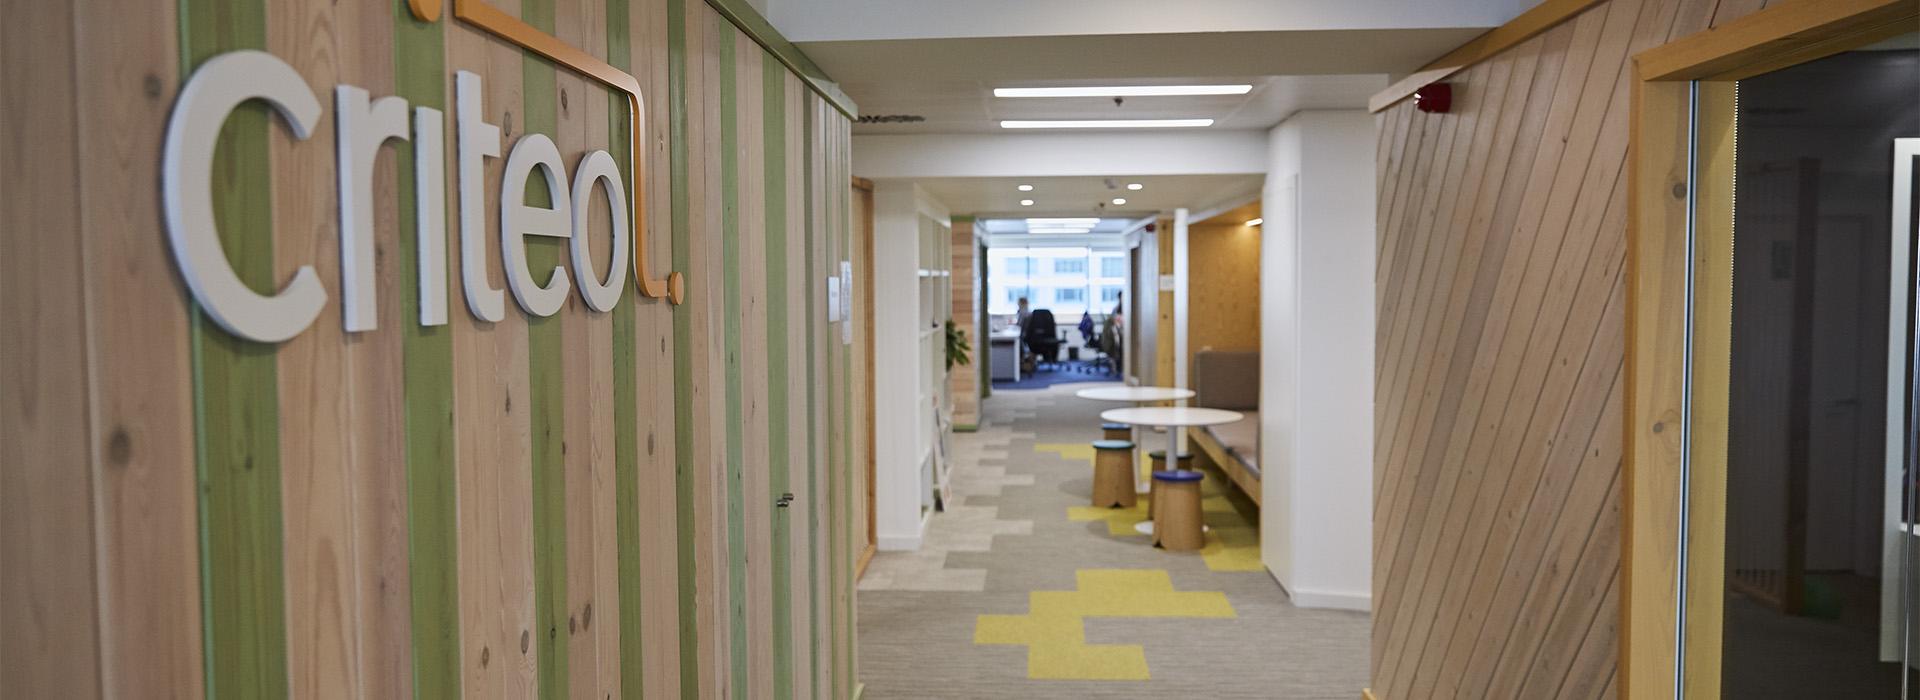 Criteo BCN hallway